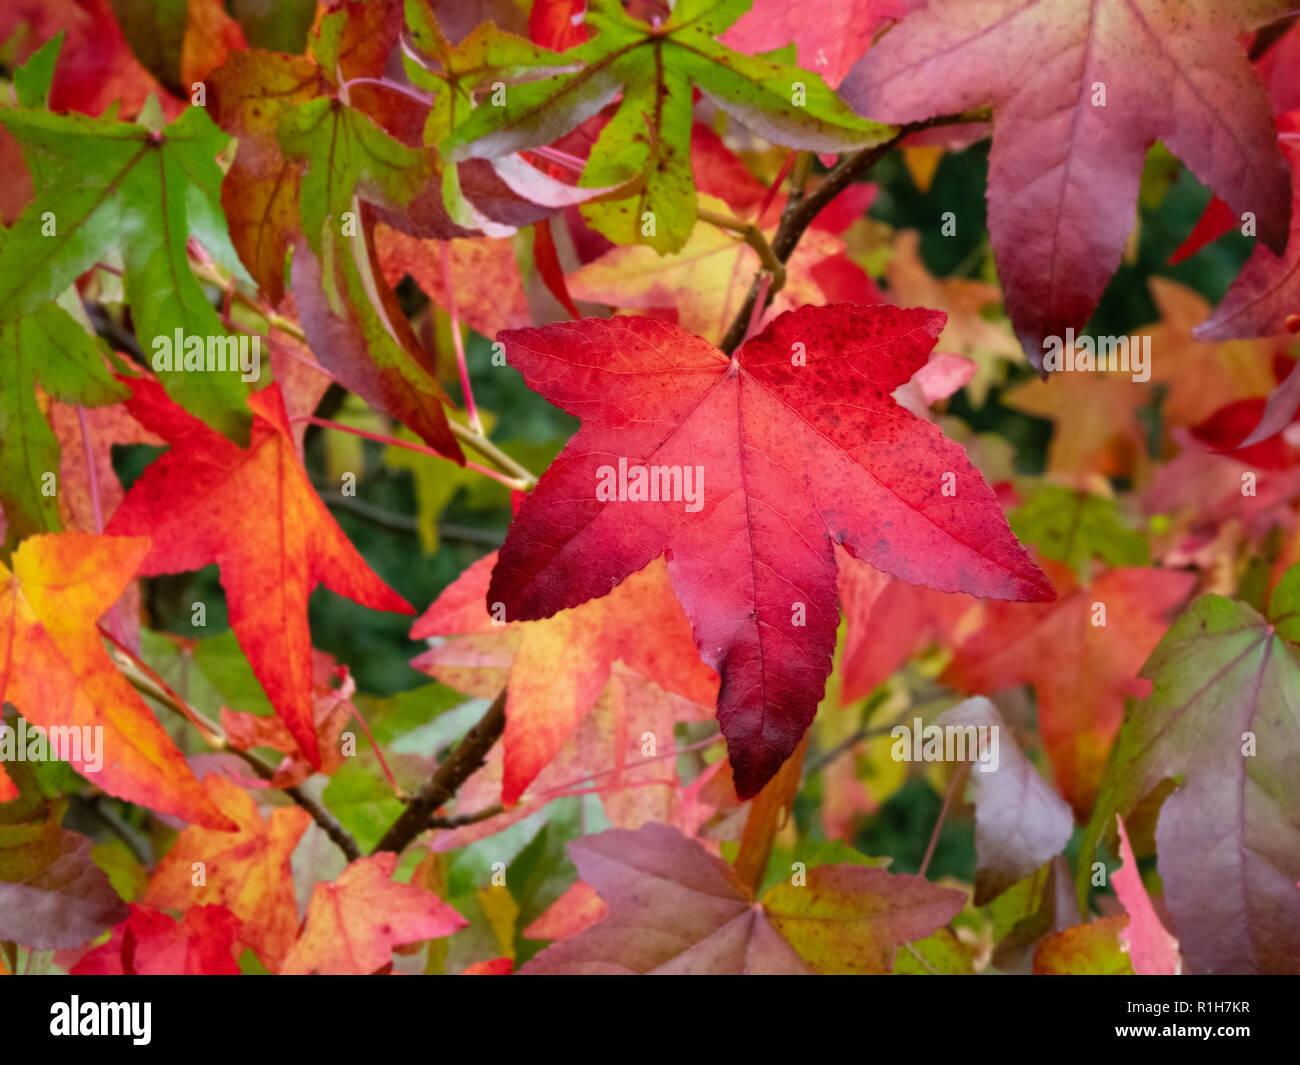 Liquidamber styraciflua leaves at Westonbirt arboretum in Gloucestershire UK showing range of colour change in autumn - Stock Image